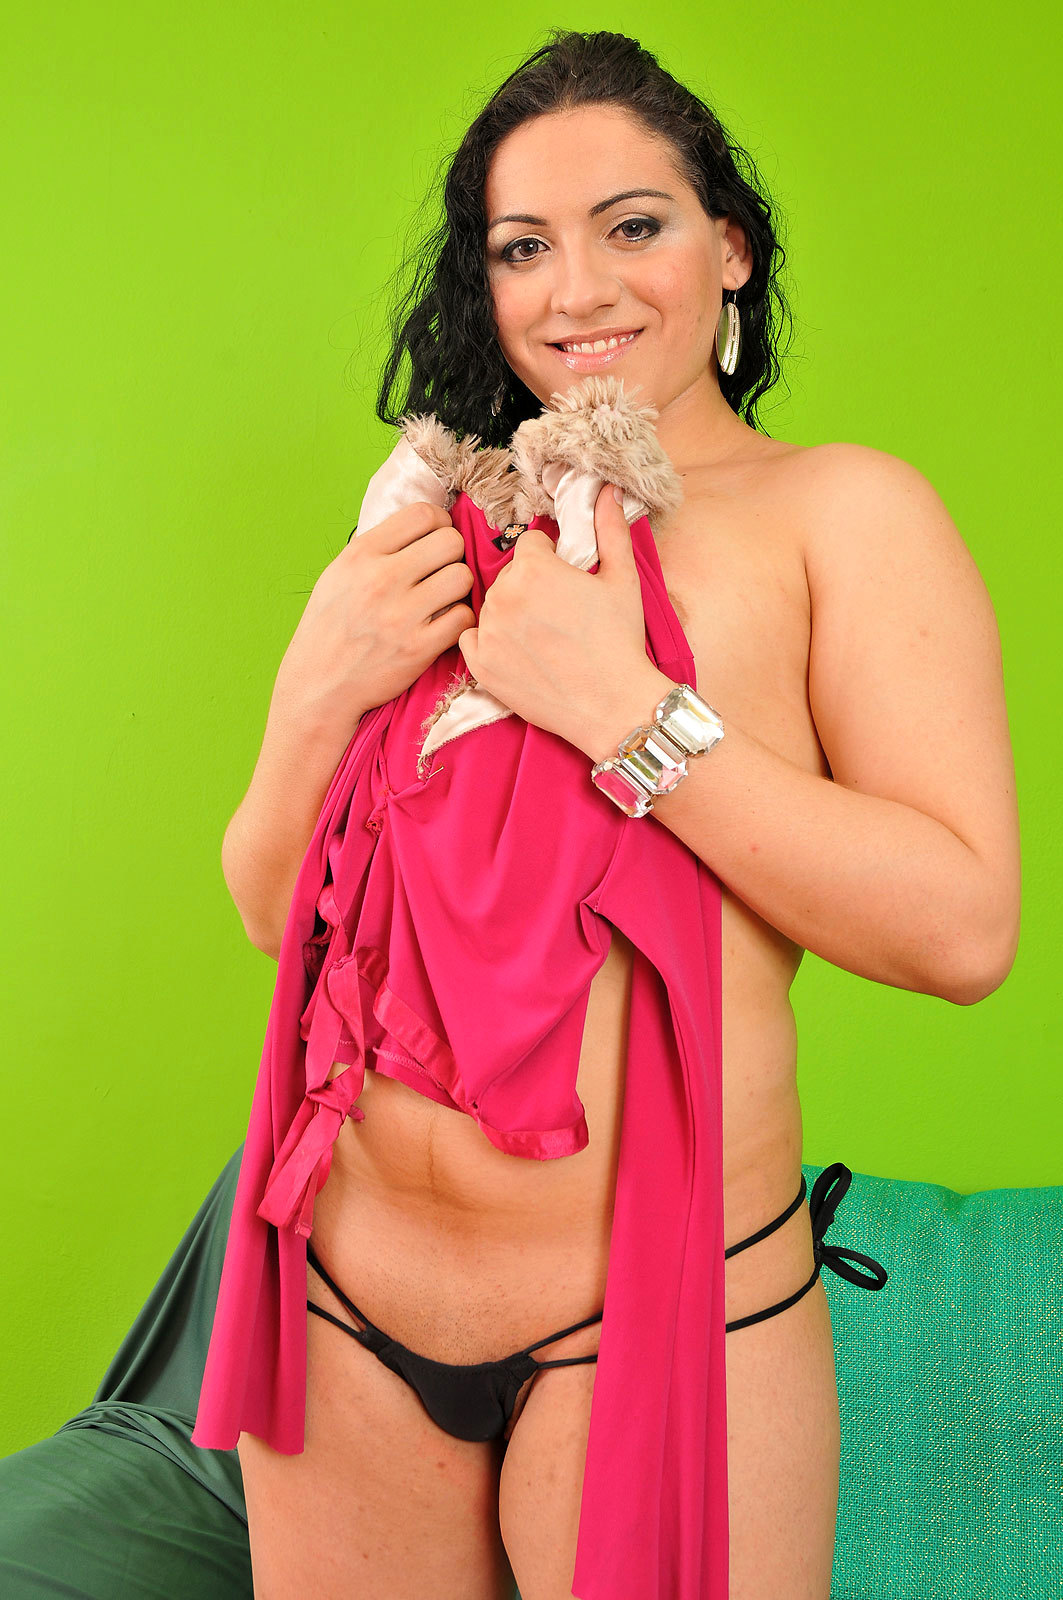 Steamy Brunette T-Girl Raissa Sampaio Strips Down Outfit